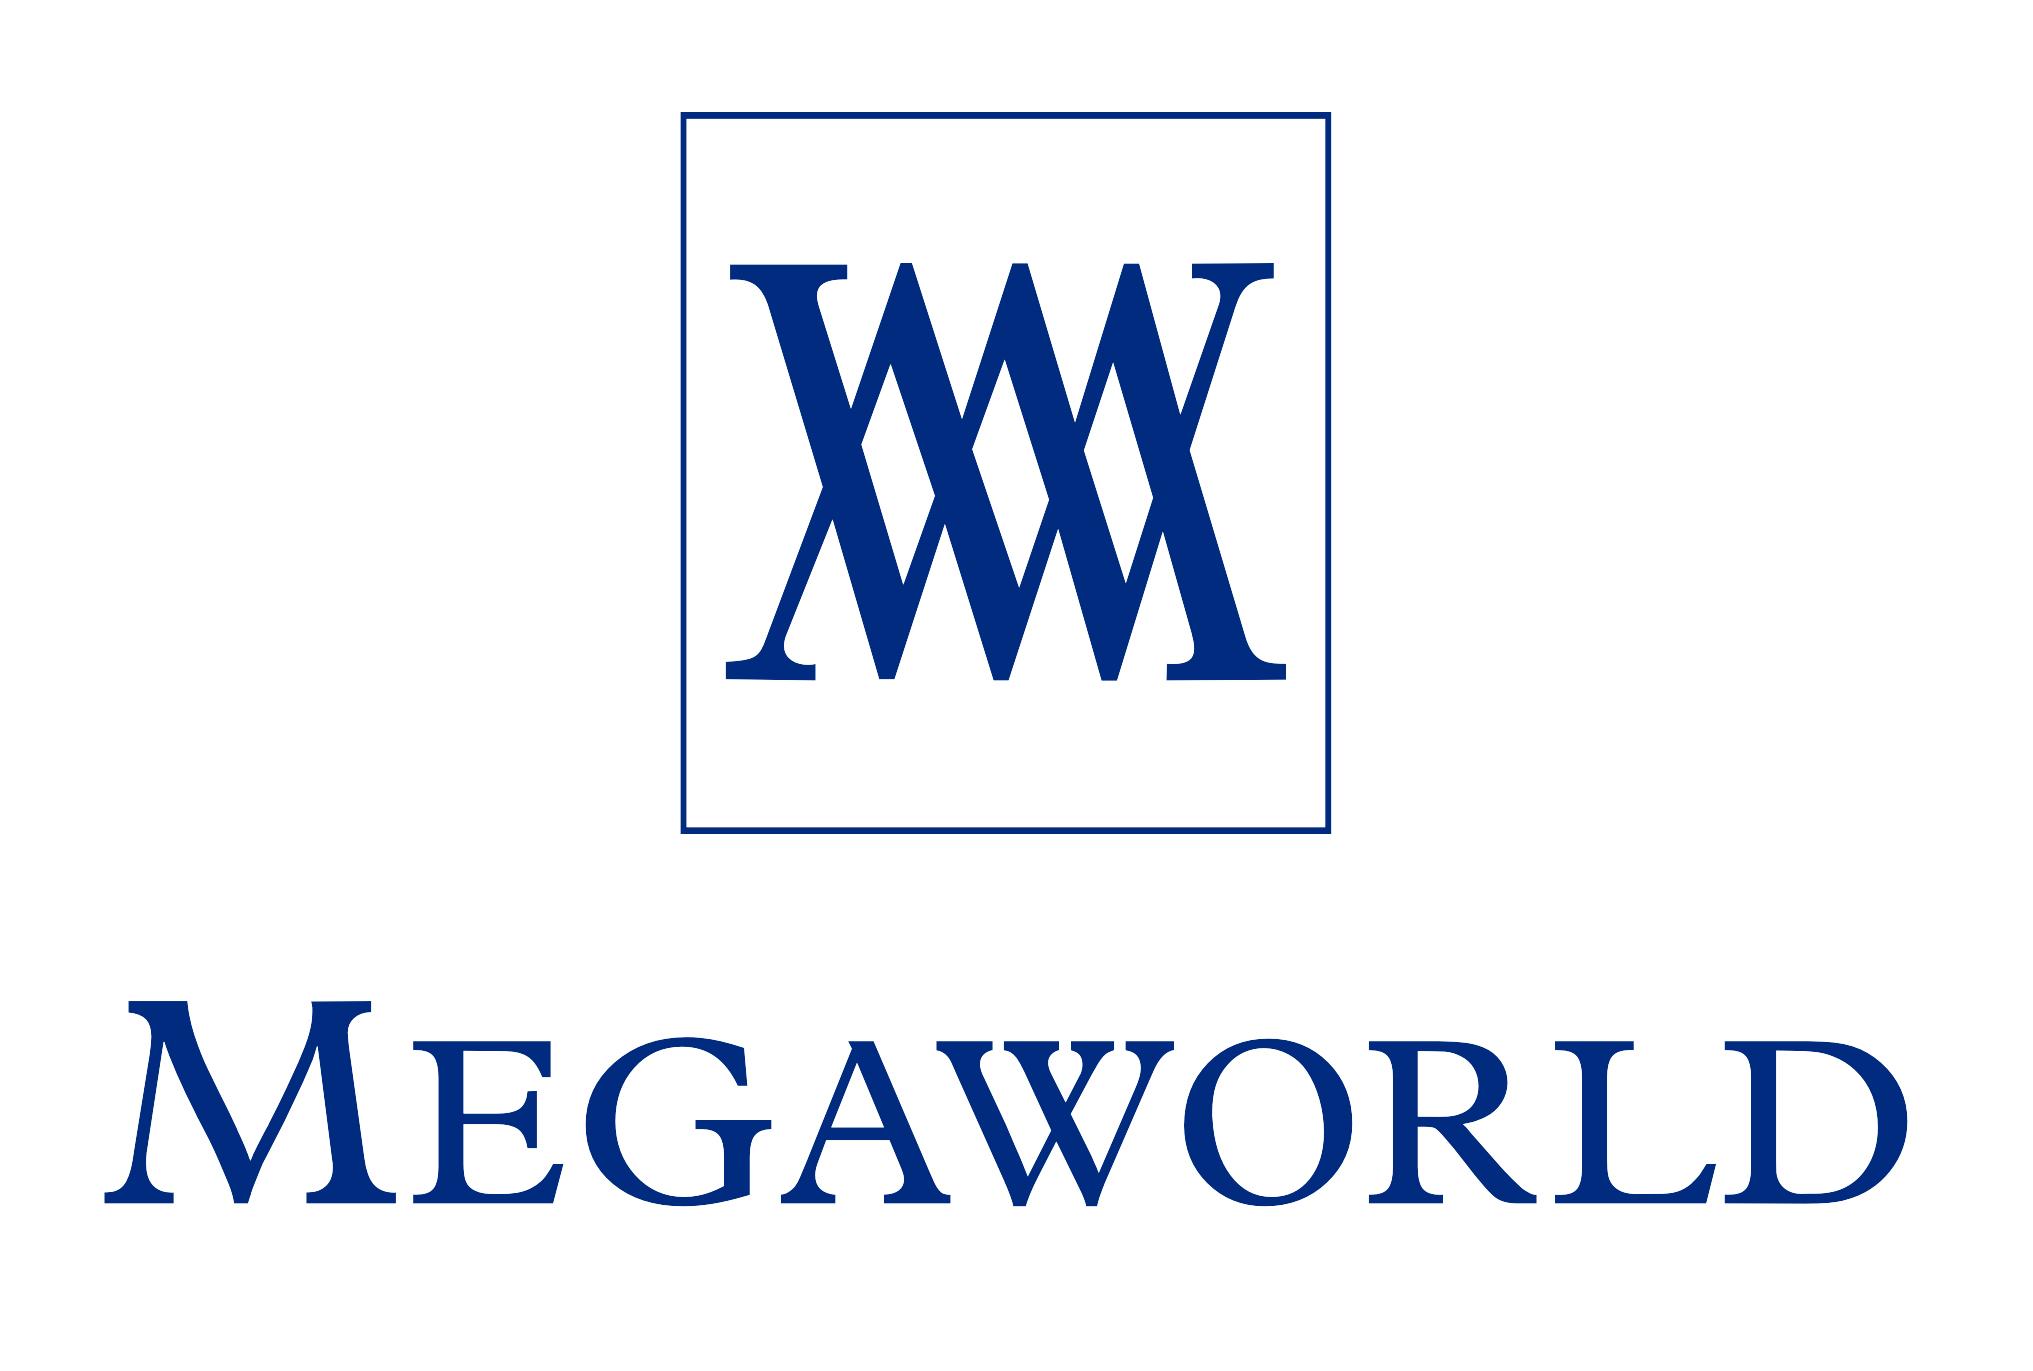 Megaworld 2015 Income of Philippine Real Estate Developers